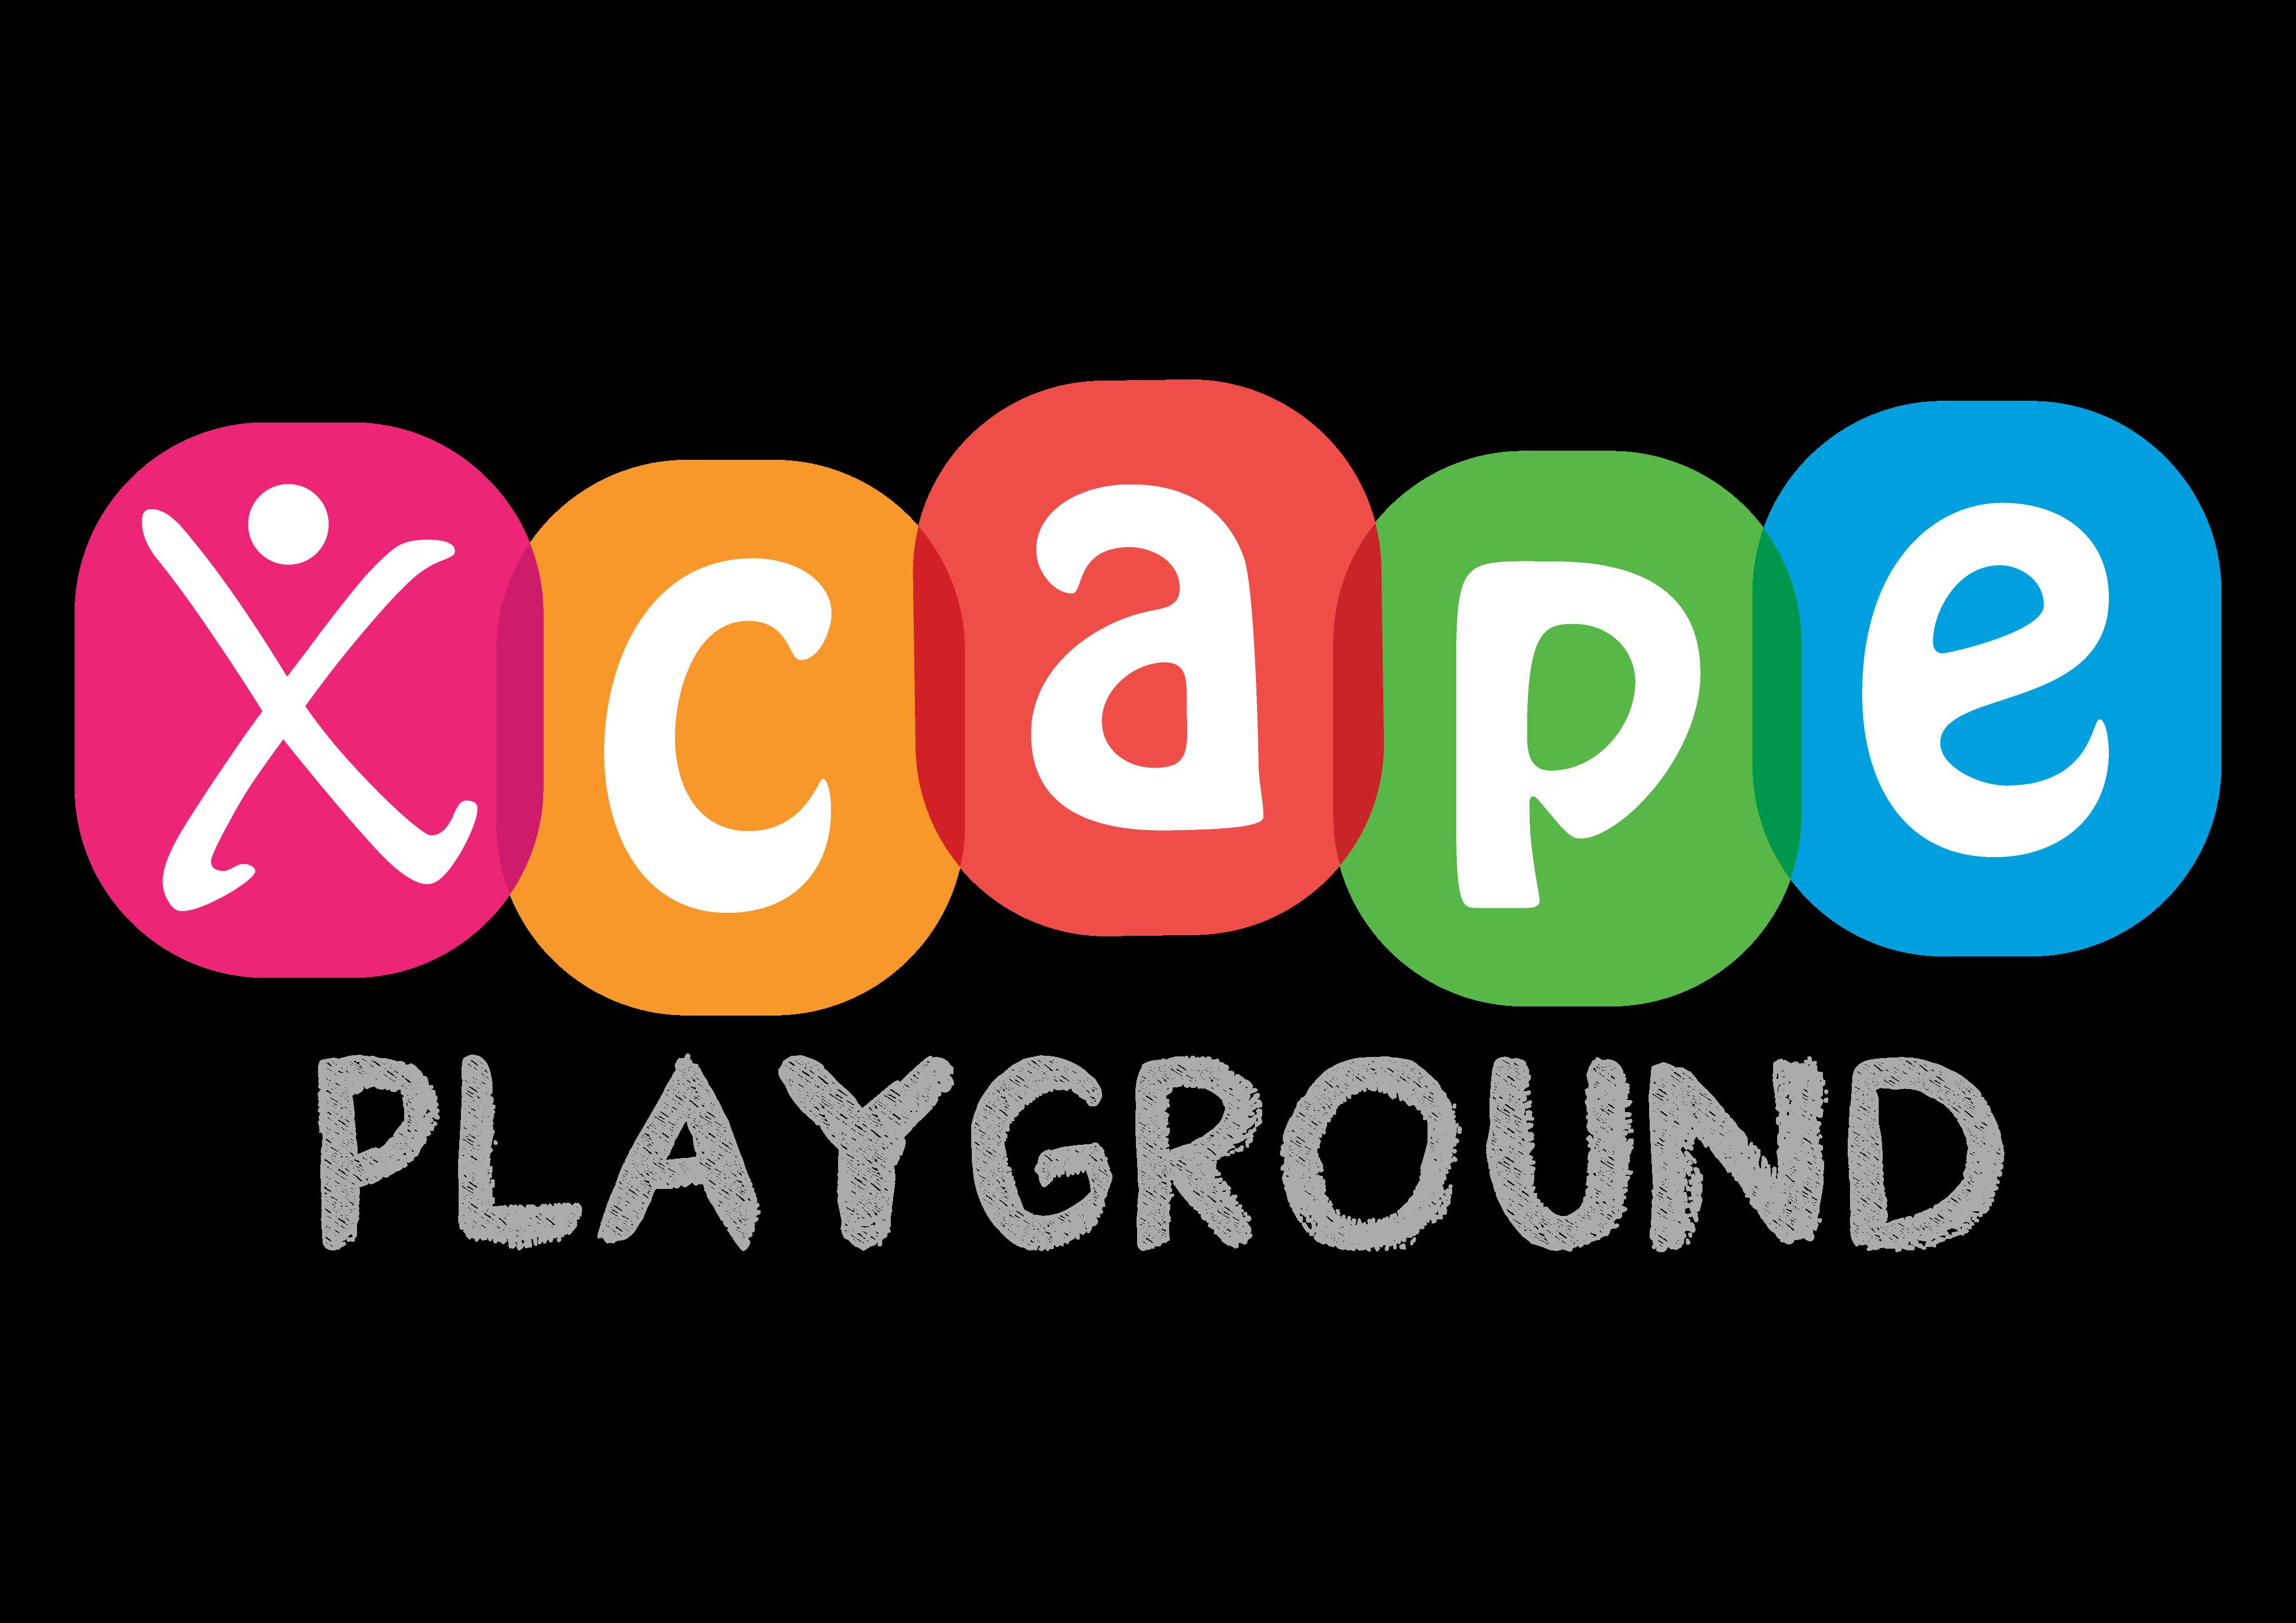 logo - Xcape Playground